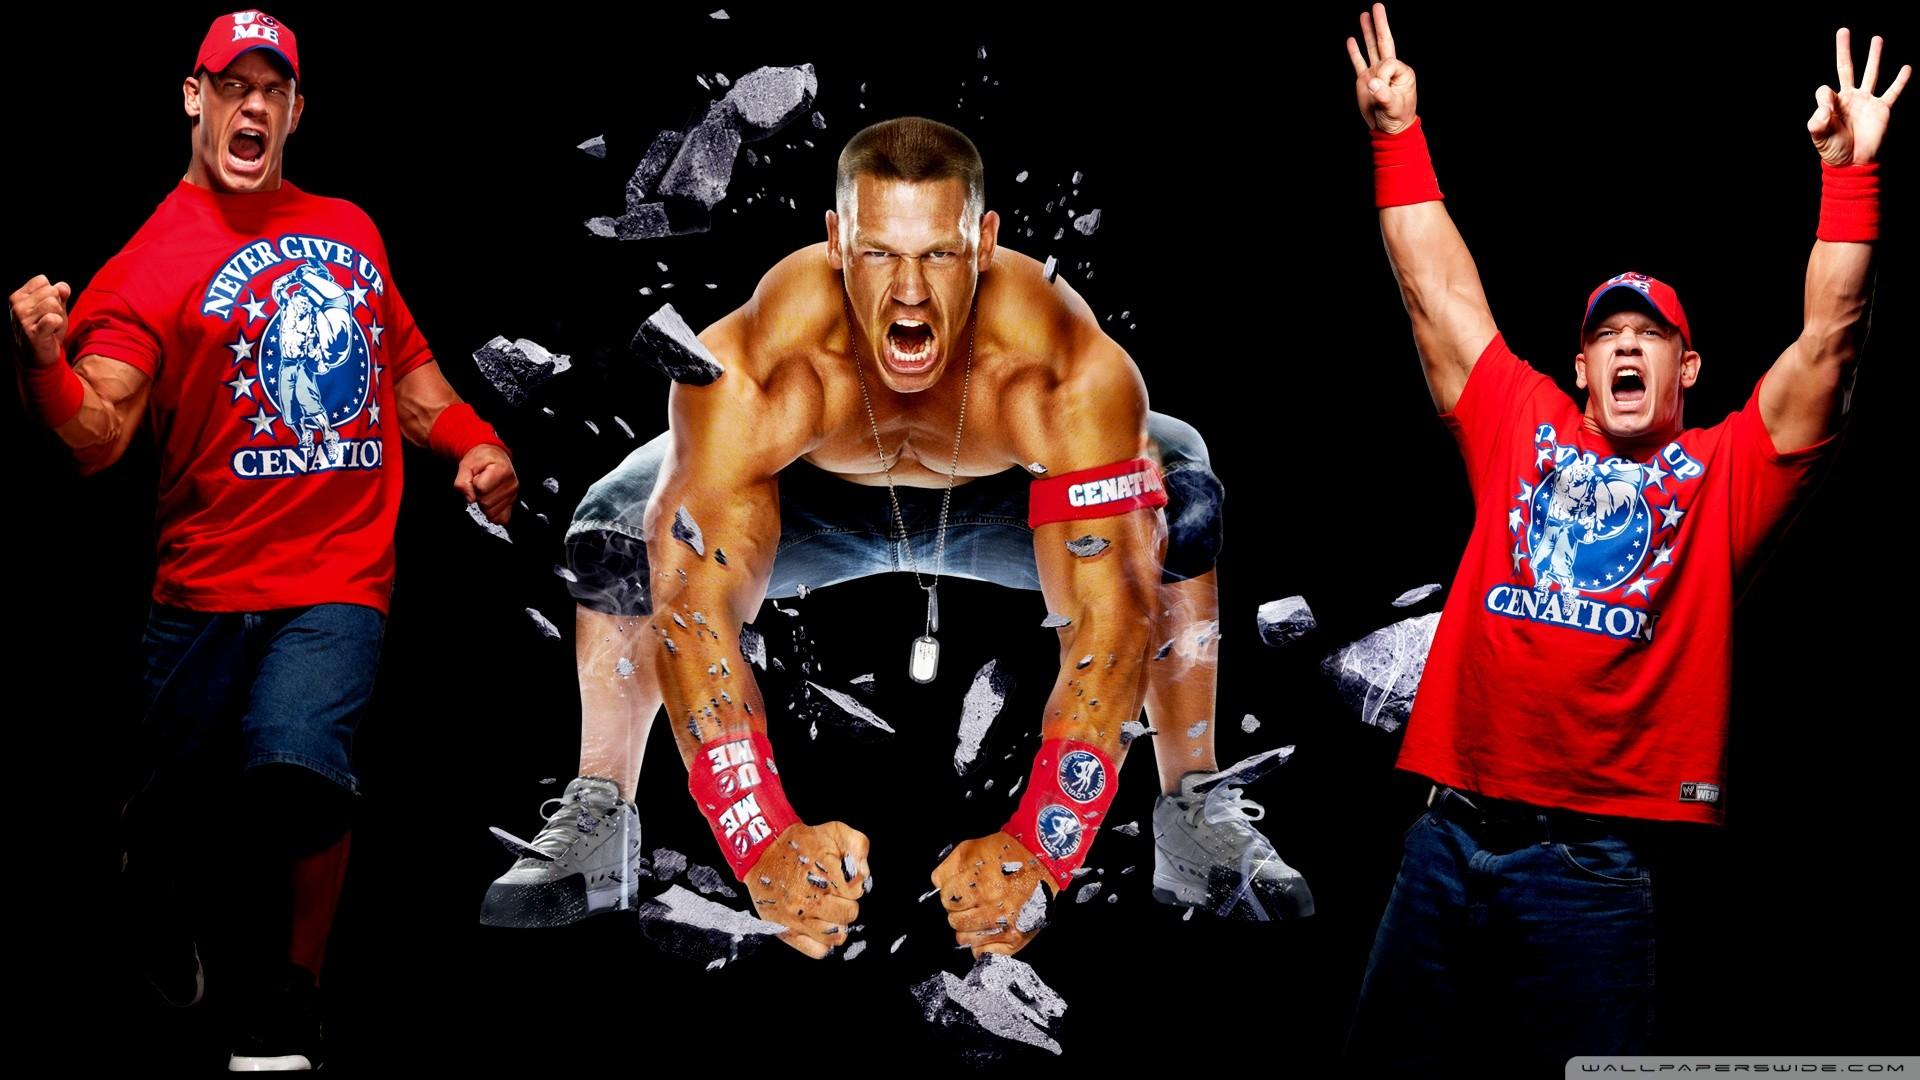 John Cena Never Give Up Cenation HD Wallpaper Sport .